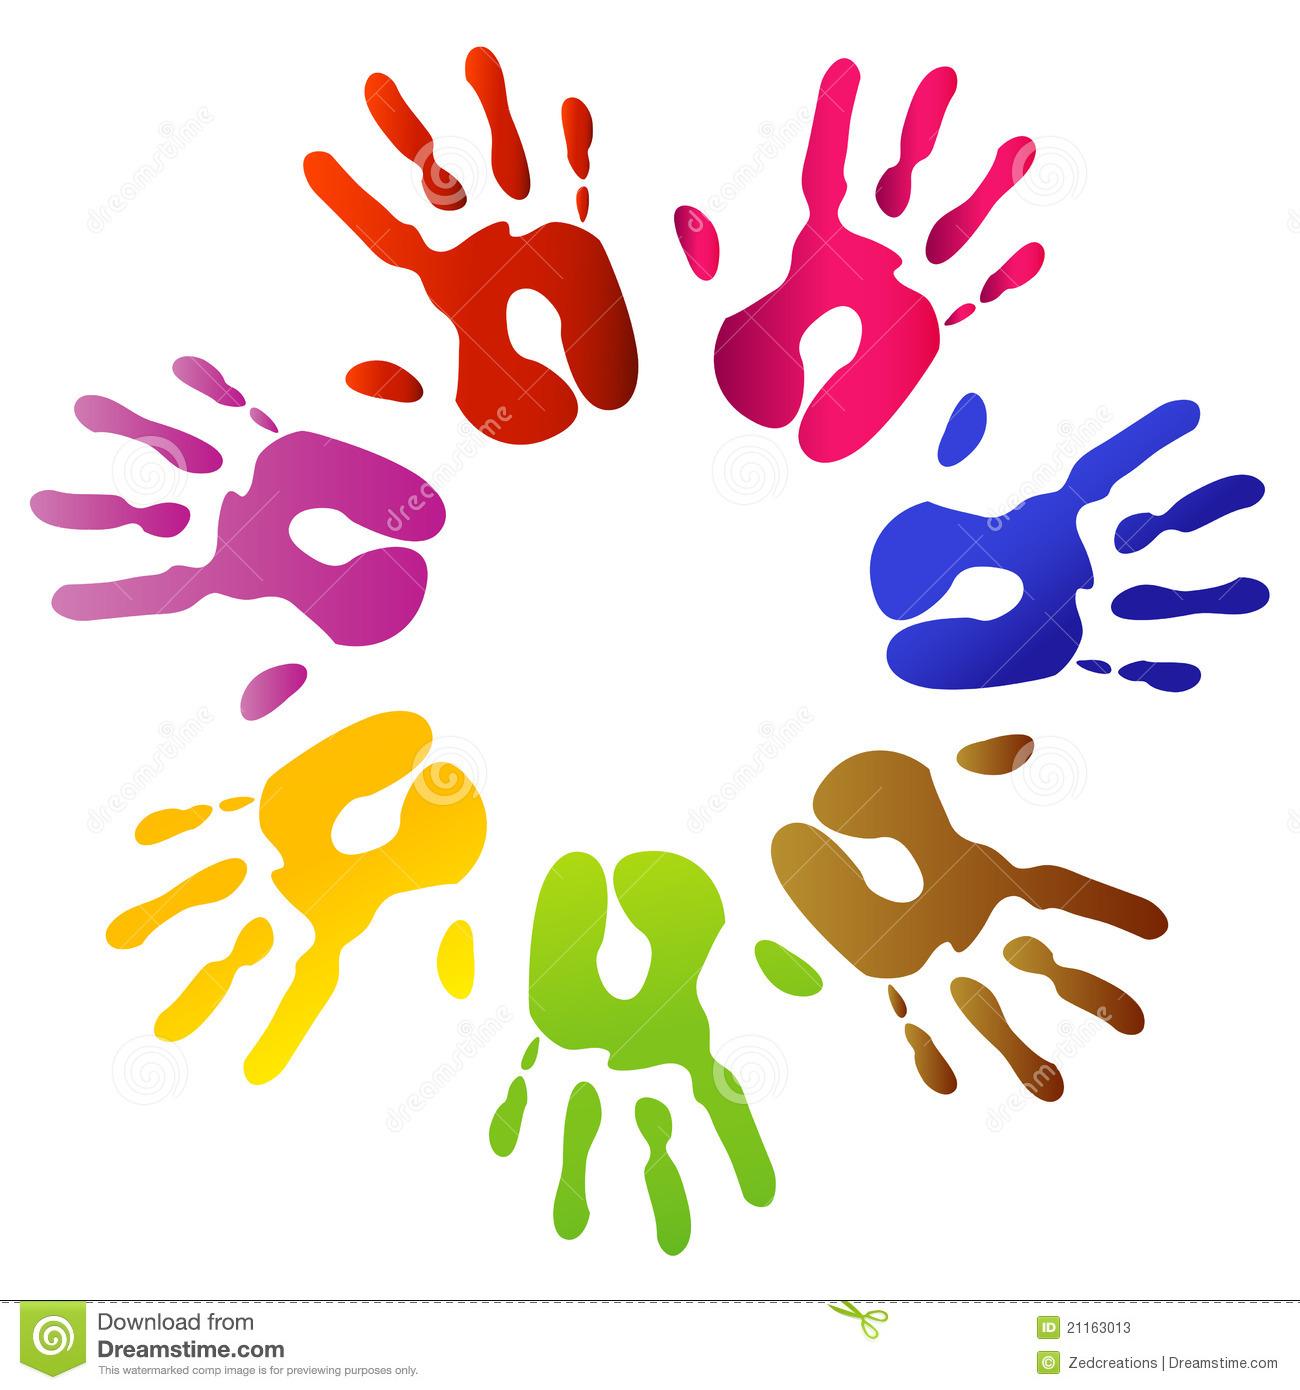 Handprint clipart circle. Hand print clip art